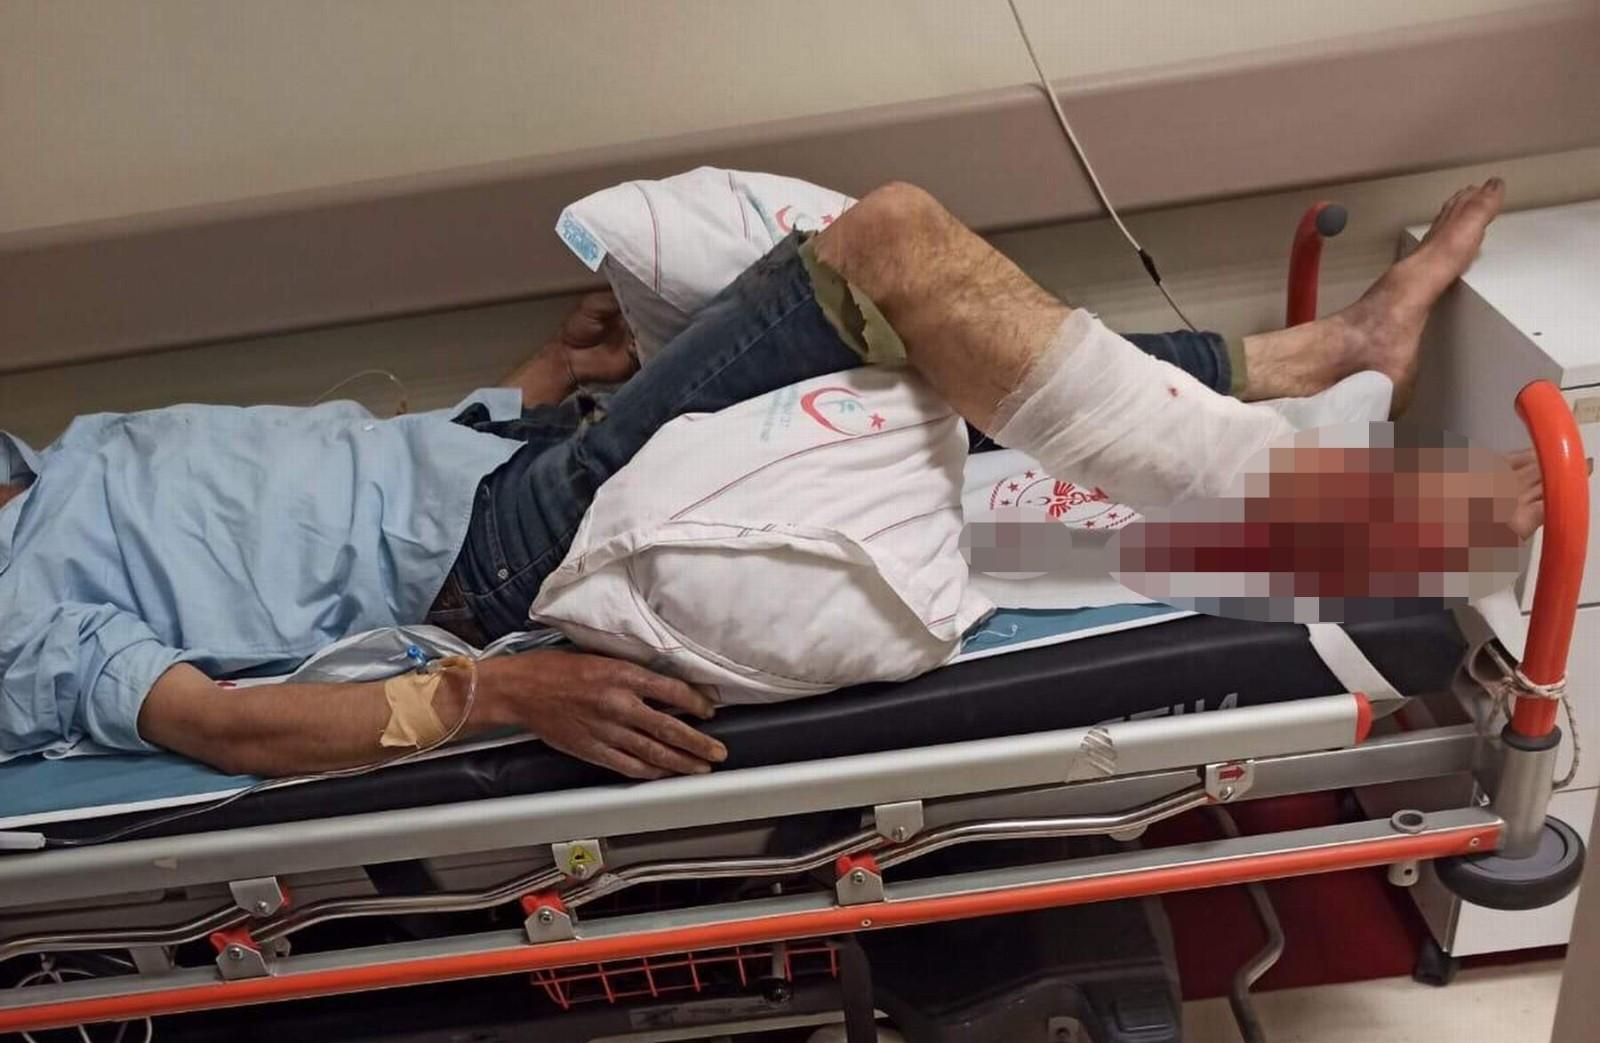 Siirt'te ayının saldırısına uğrayan çoban yaralandı